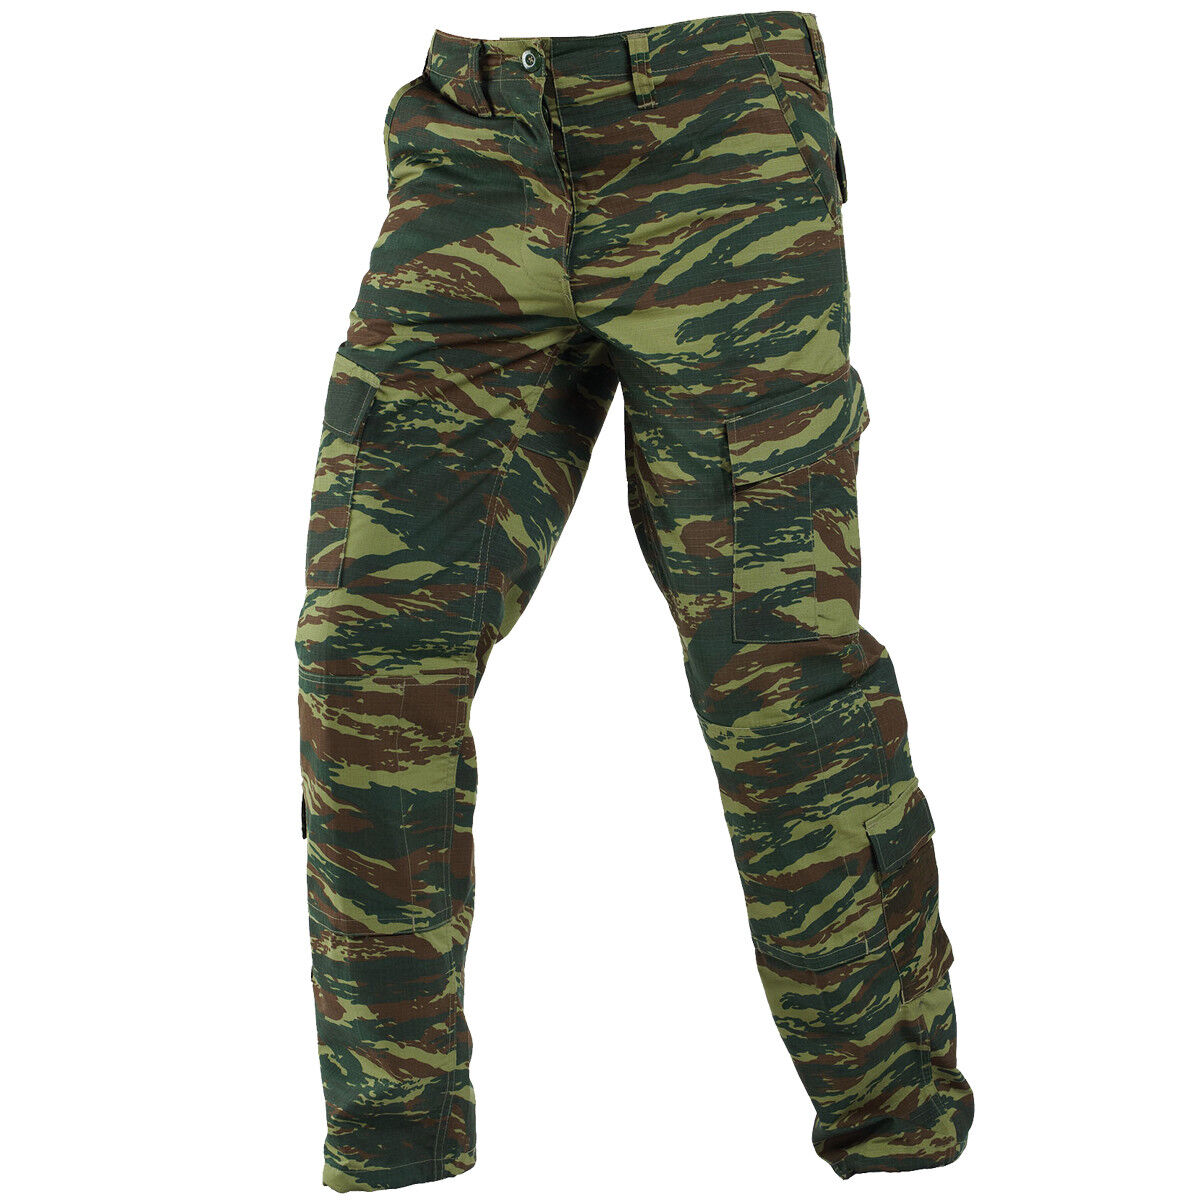 Pentagon ACU Combat Pantaloni Militari Di Airsoft Caccia Abbigliamento Uomo Luce